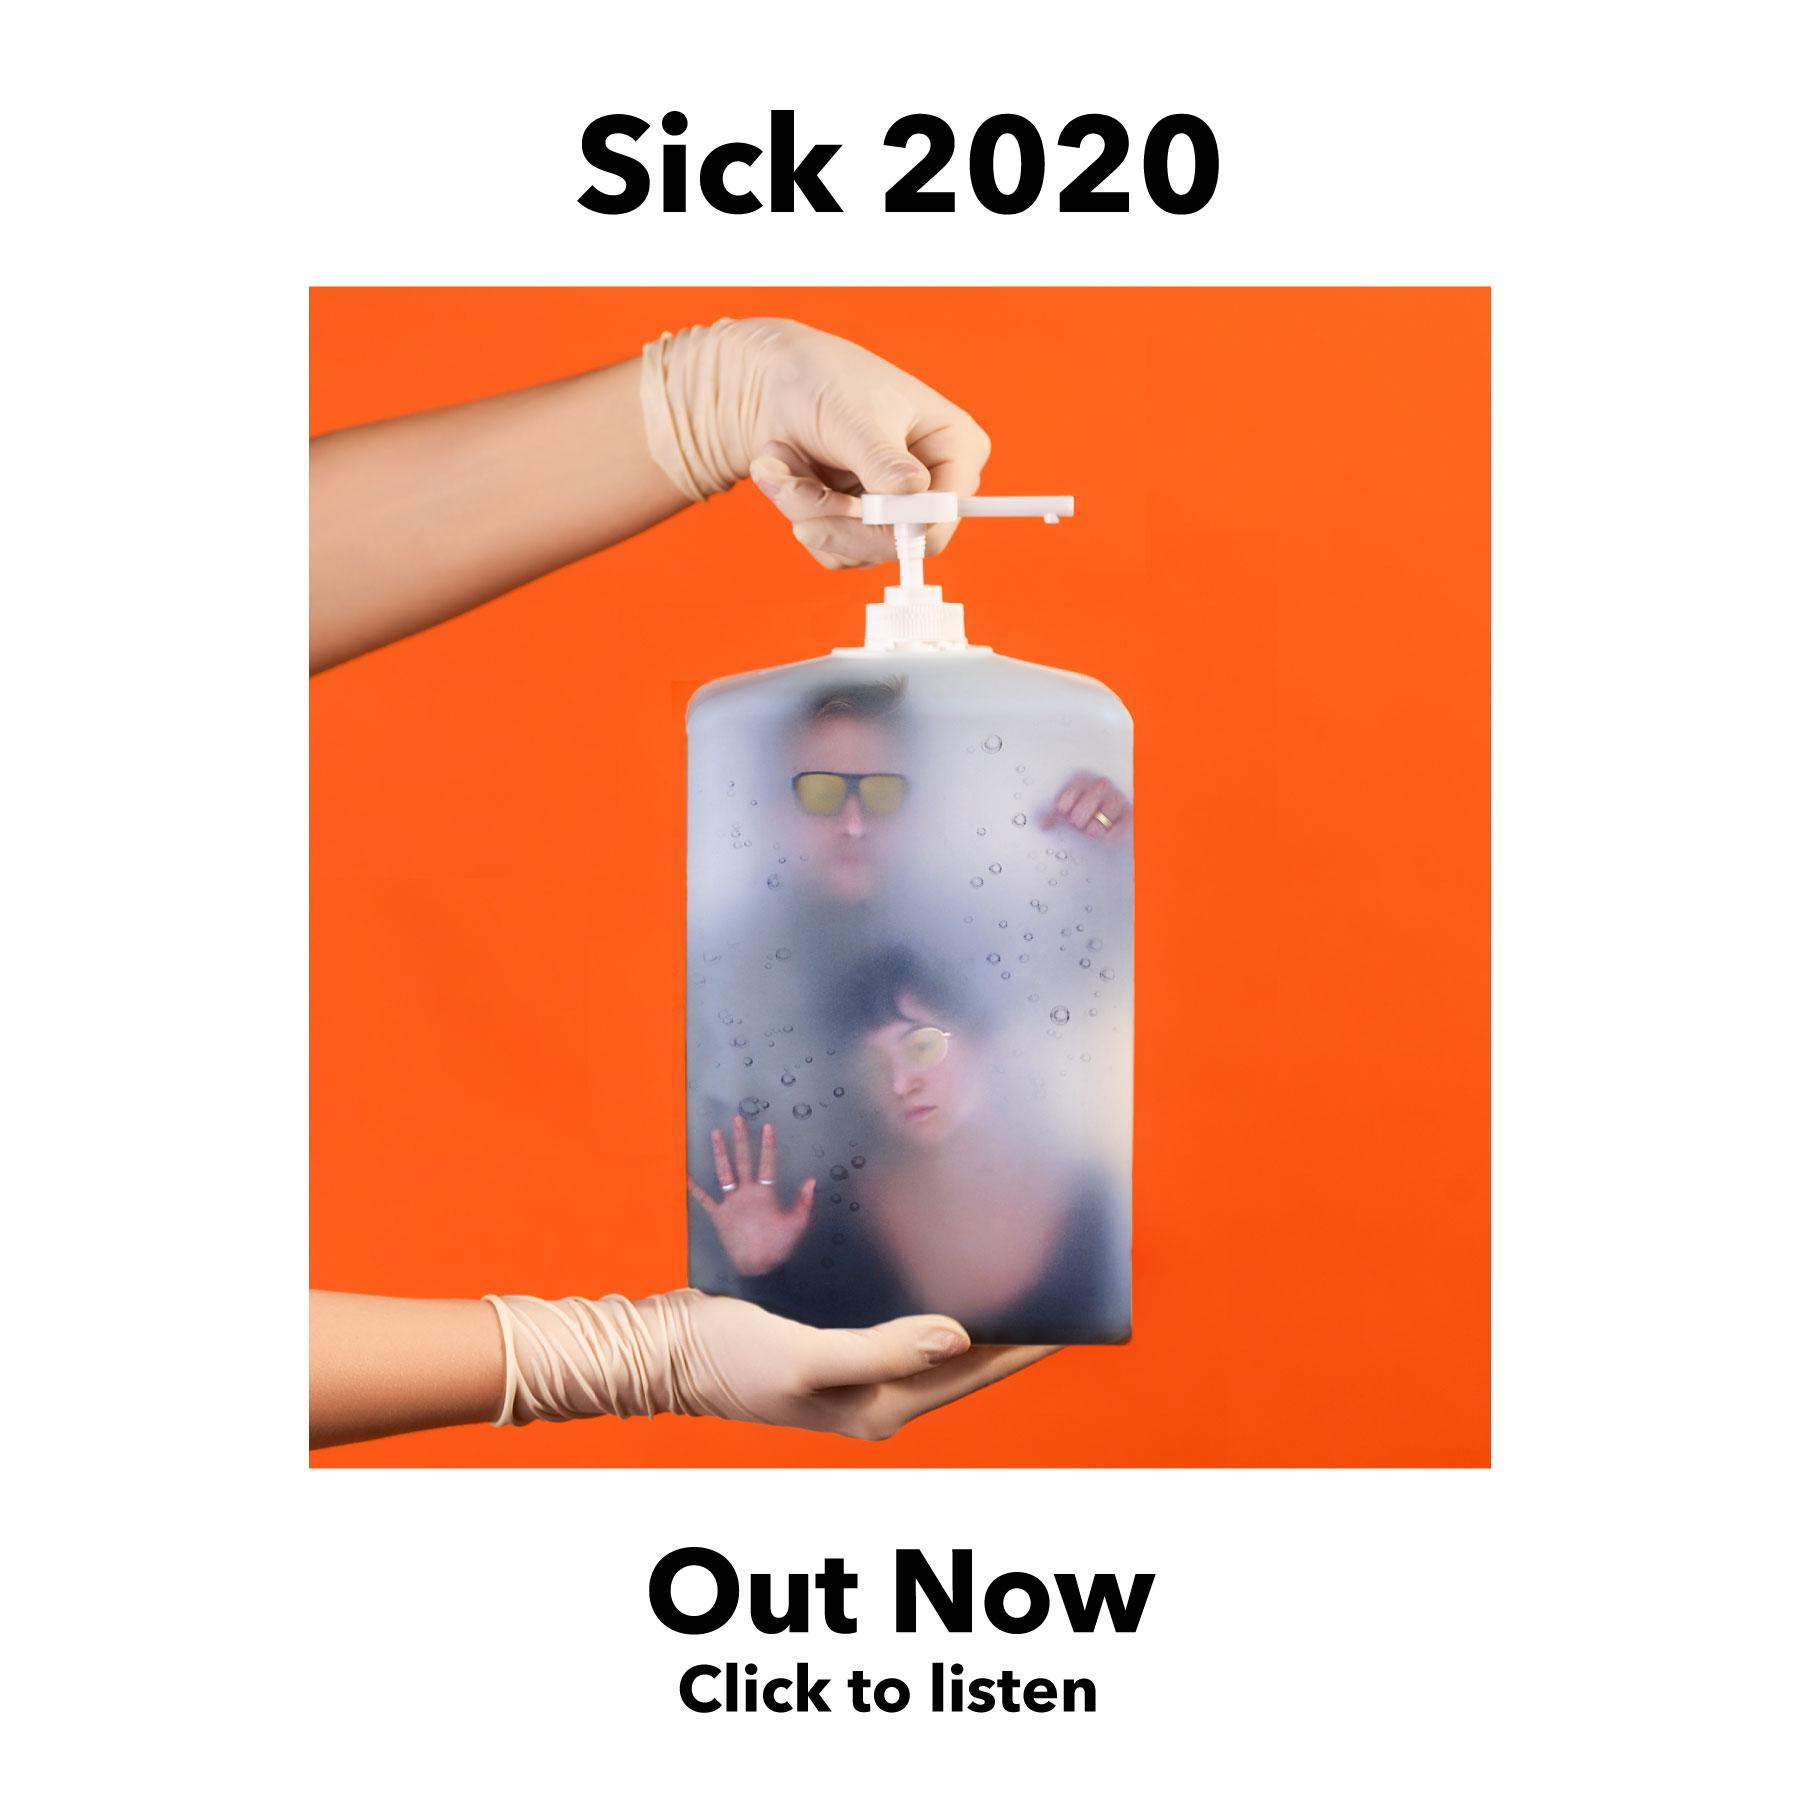 Sick 2020 FINKEL